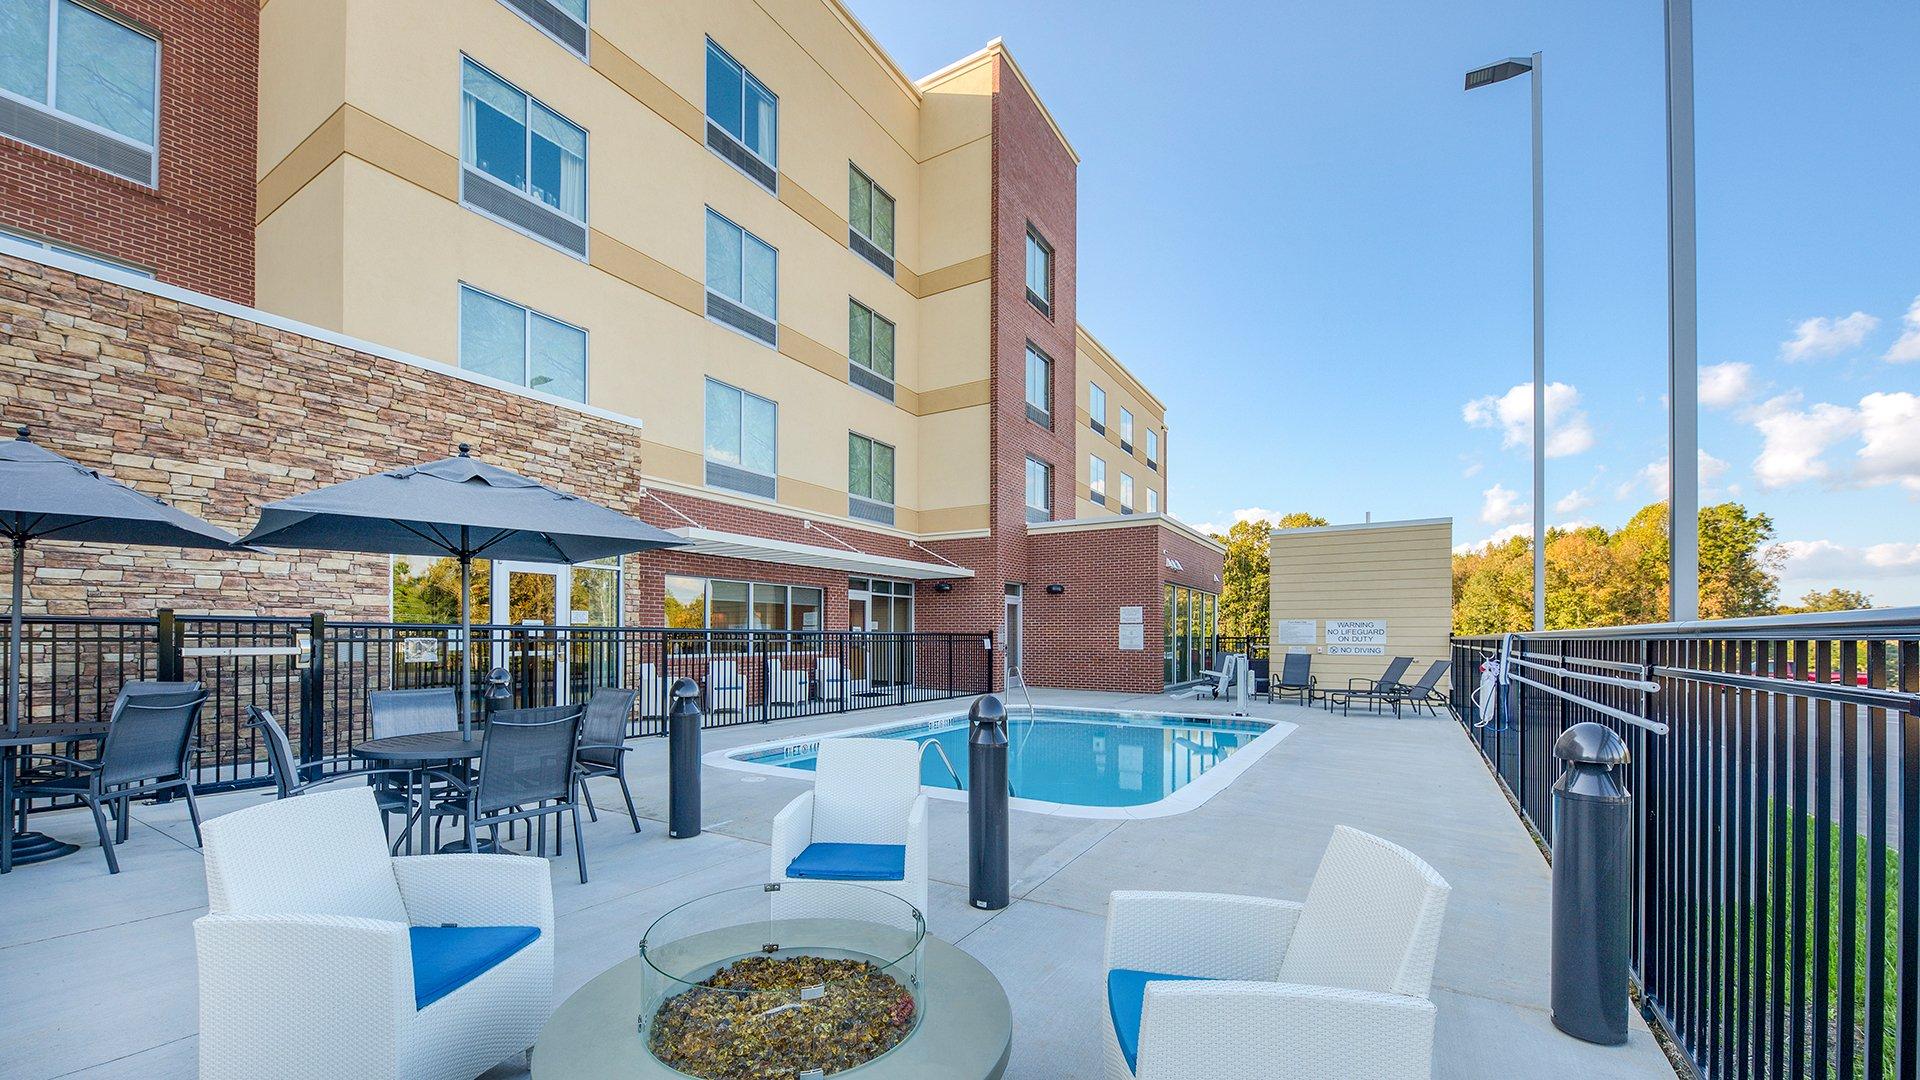 Fairfield Inn by Marriott Charlotte Belmont Pool